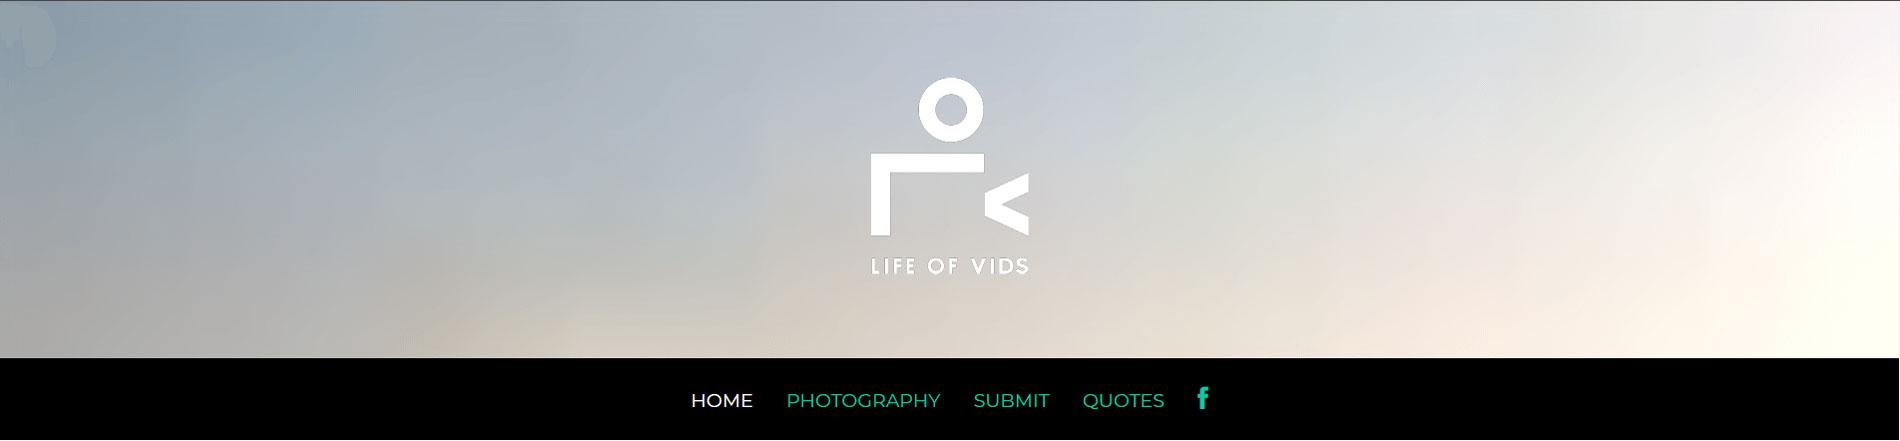 lifeofvids kostenlose Videos